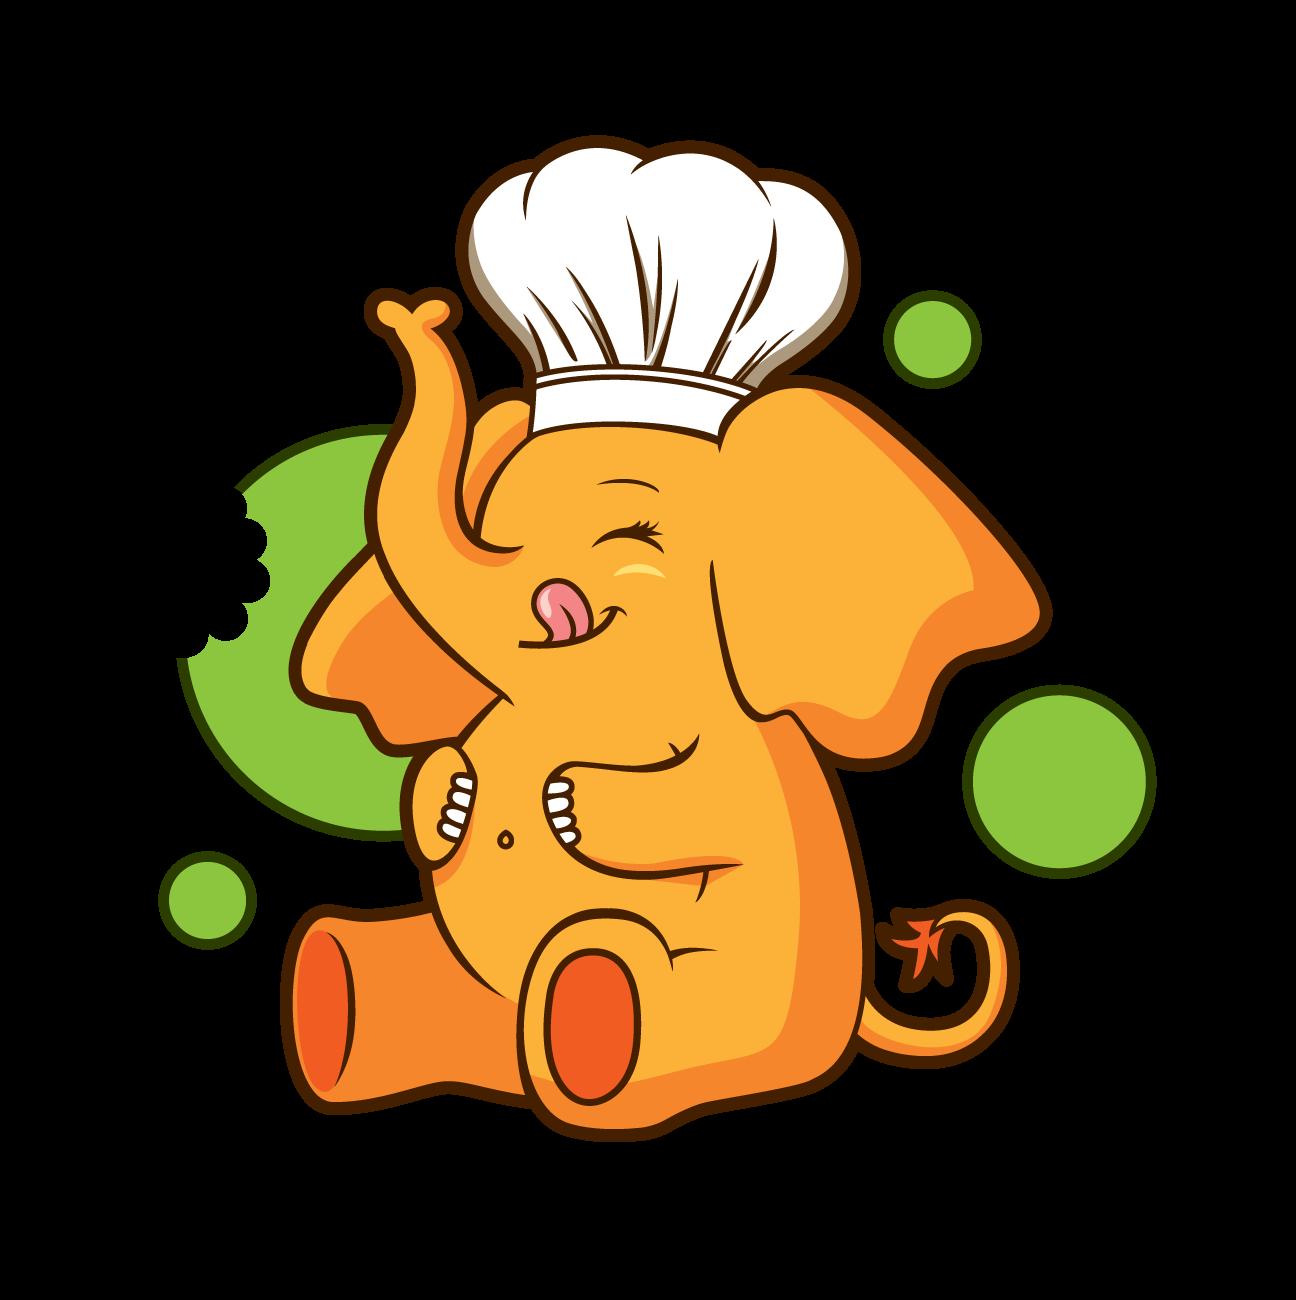 logo-immaroy-character